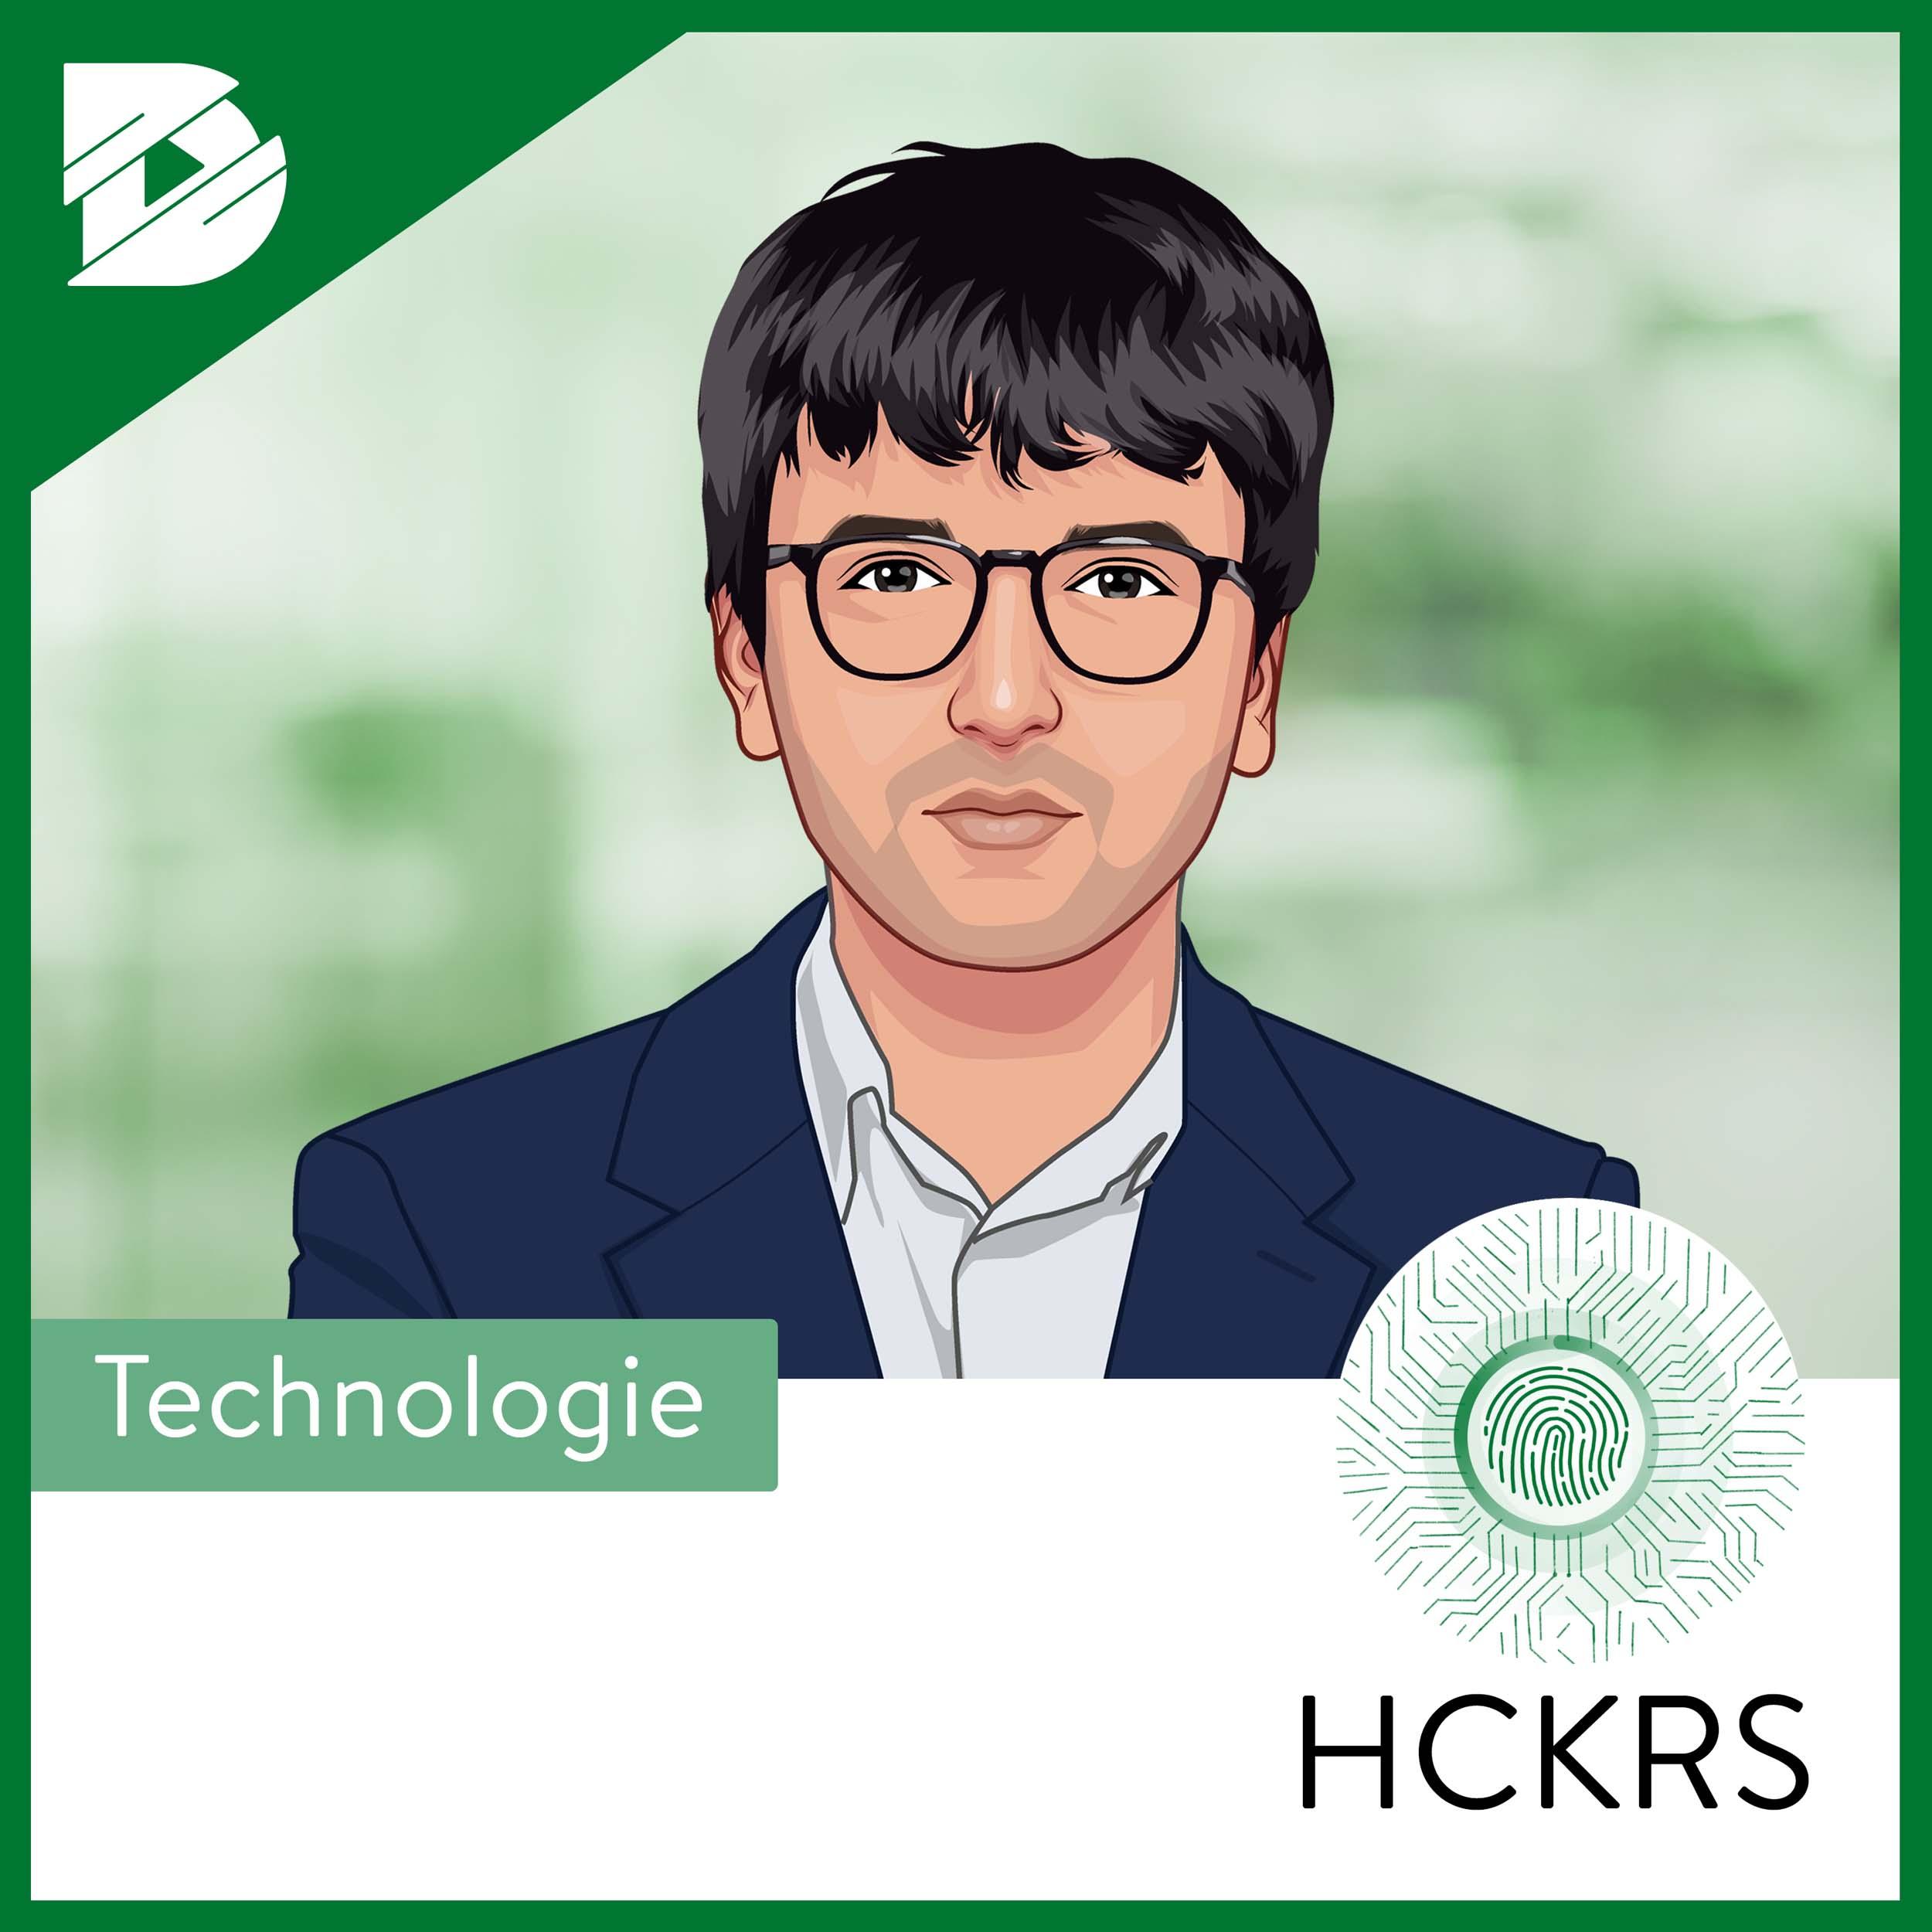 HCKRS